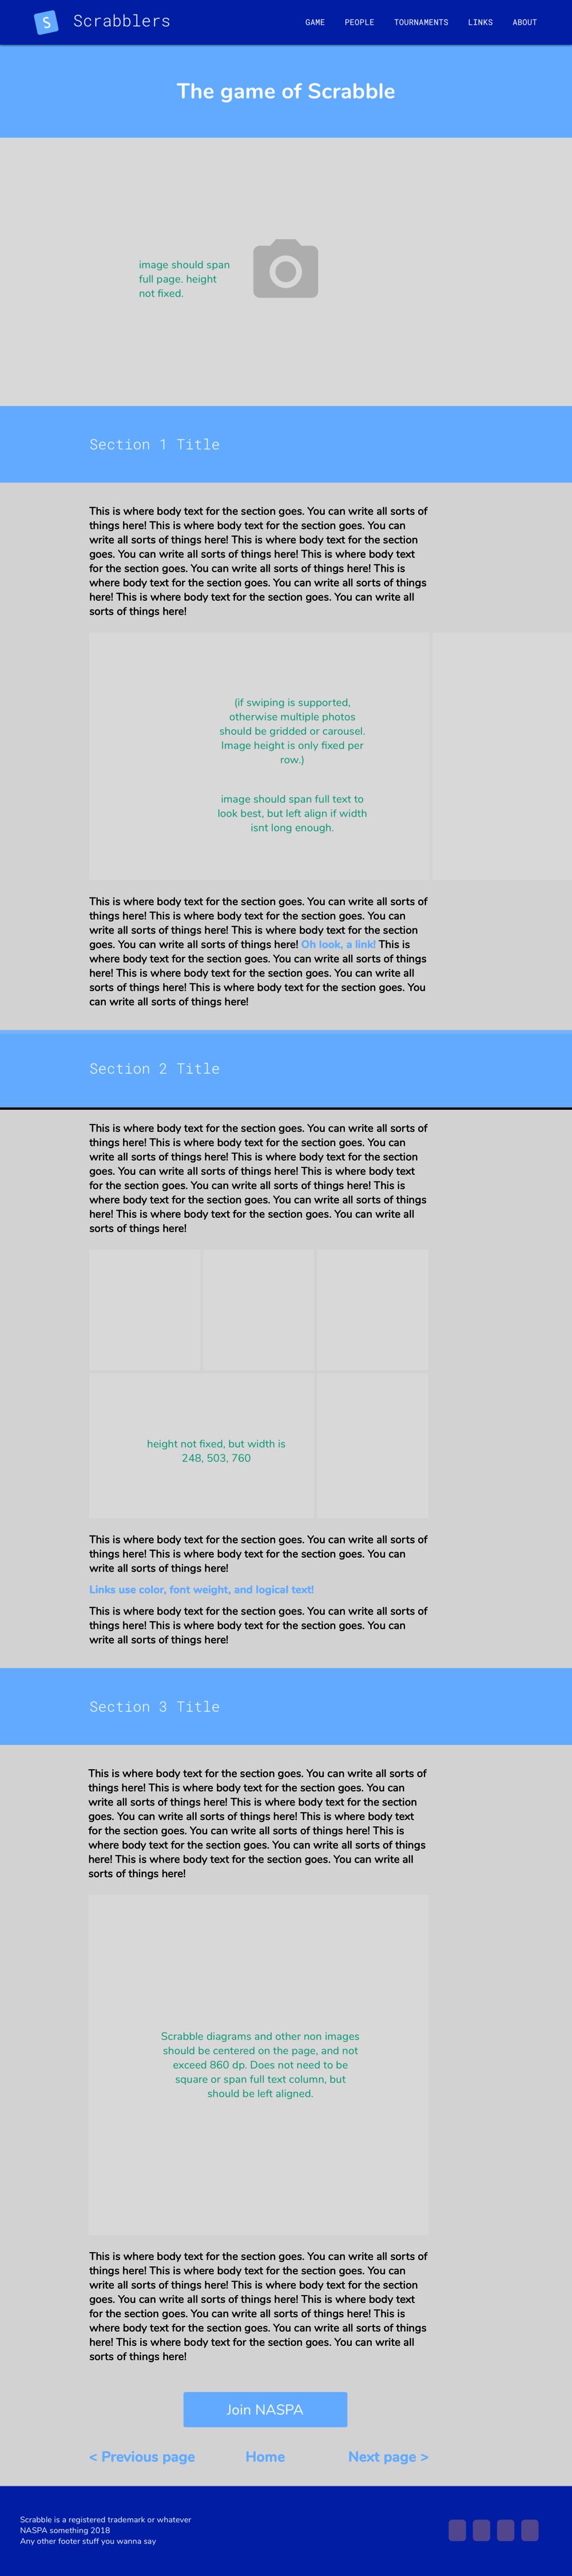 Desktop page.png